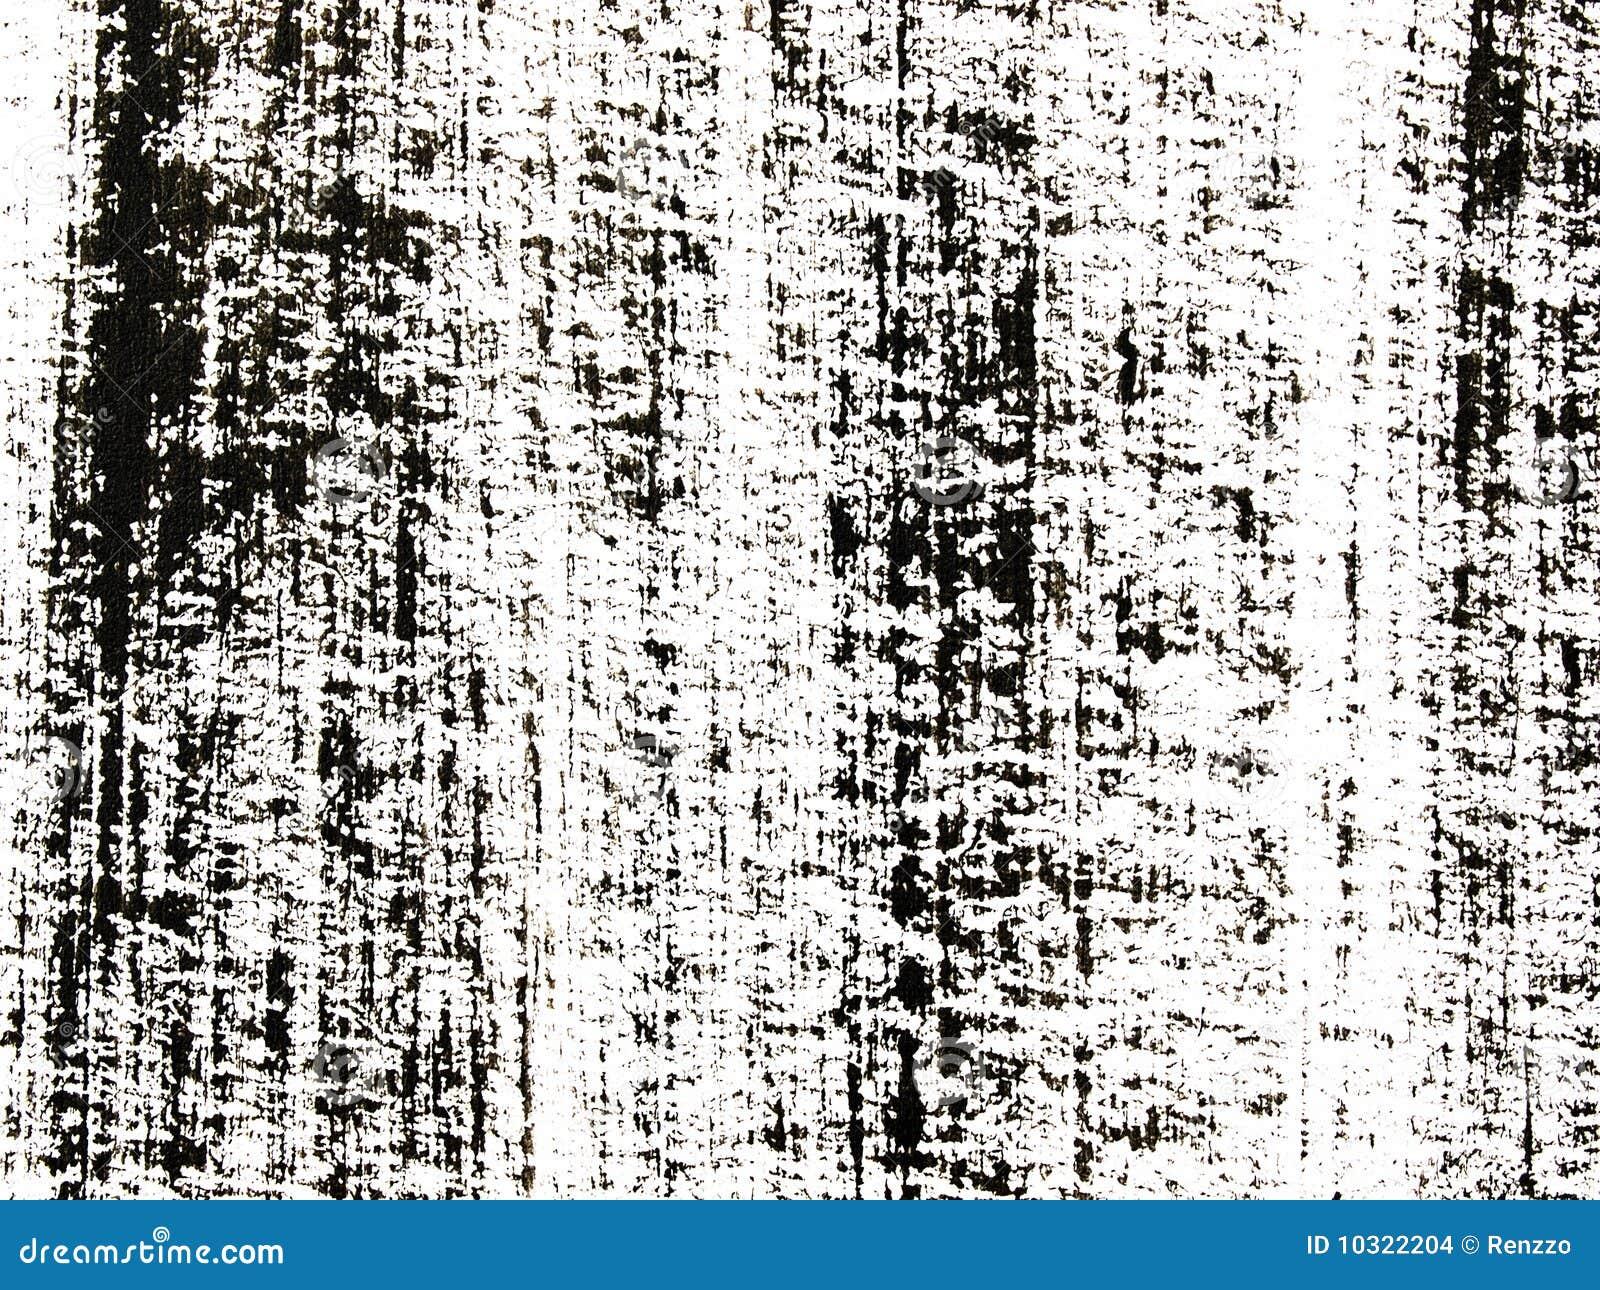 brush strokes texture - photo #28